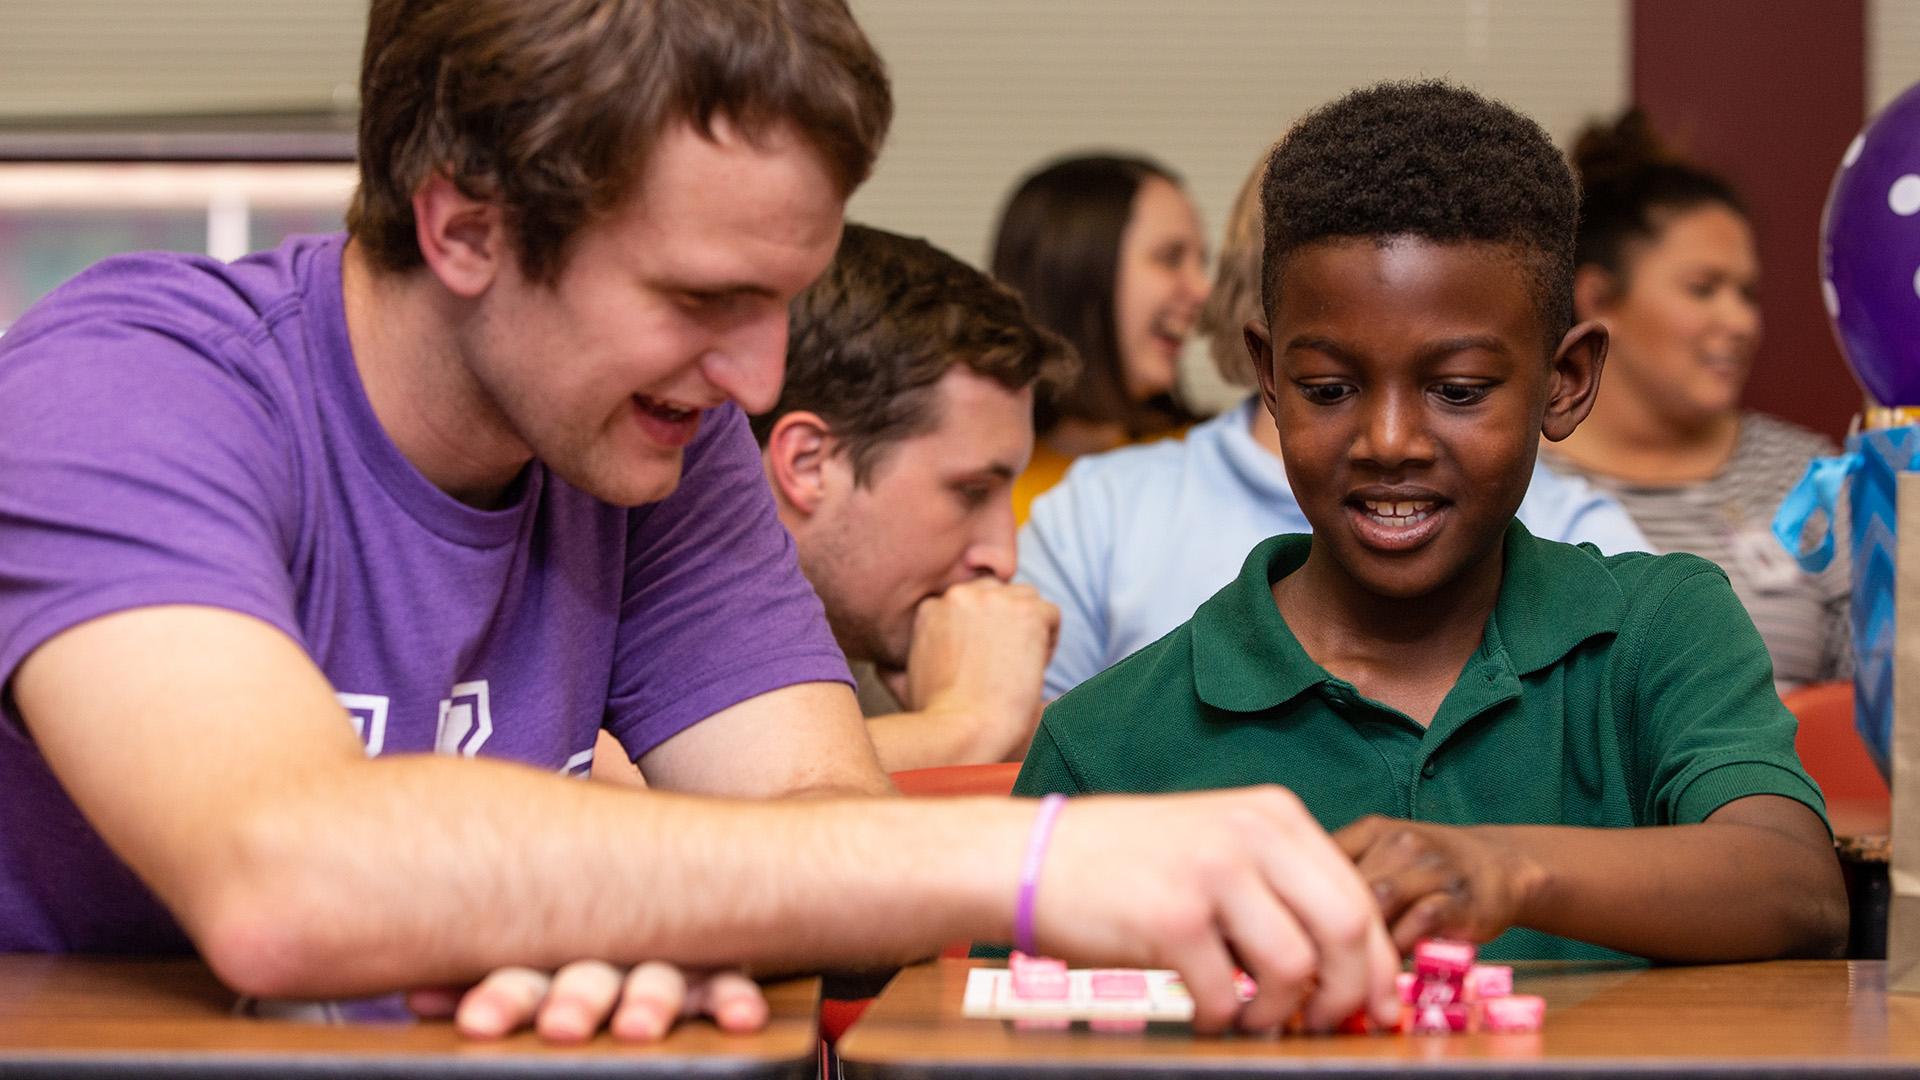 UE School of Education Reaches $1 Million in Grants Since 2017